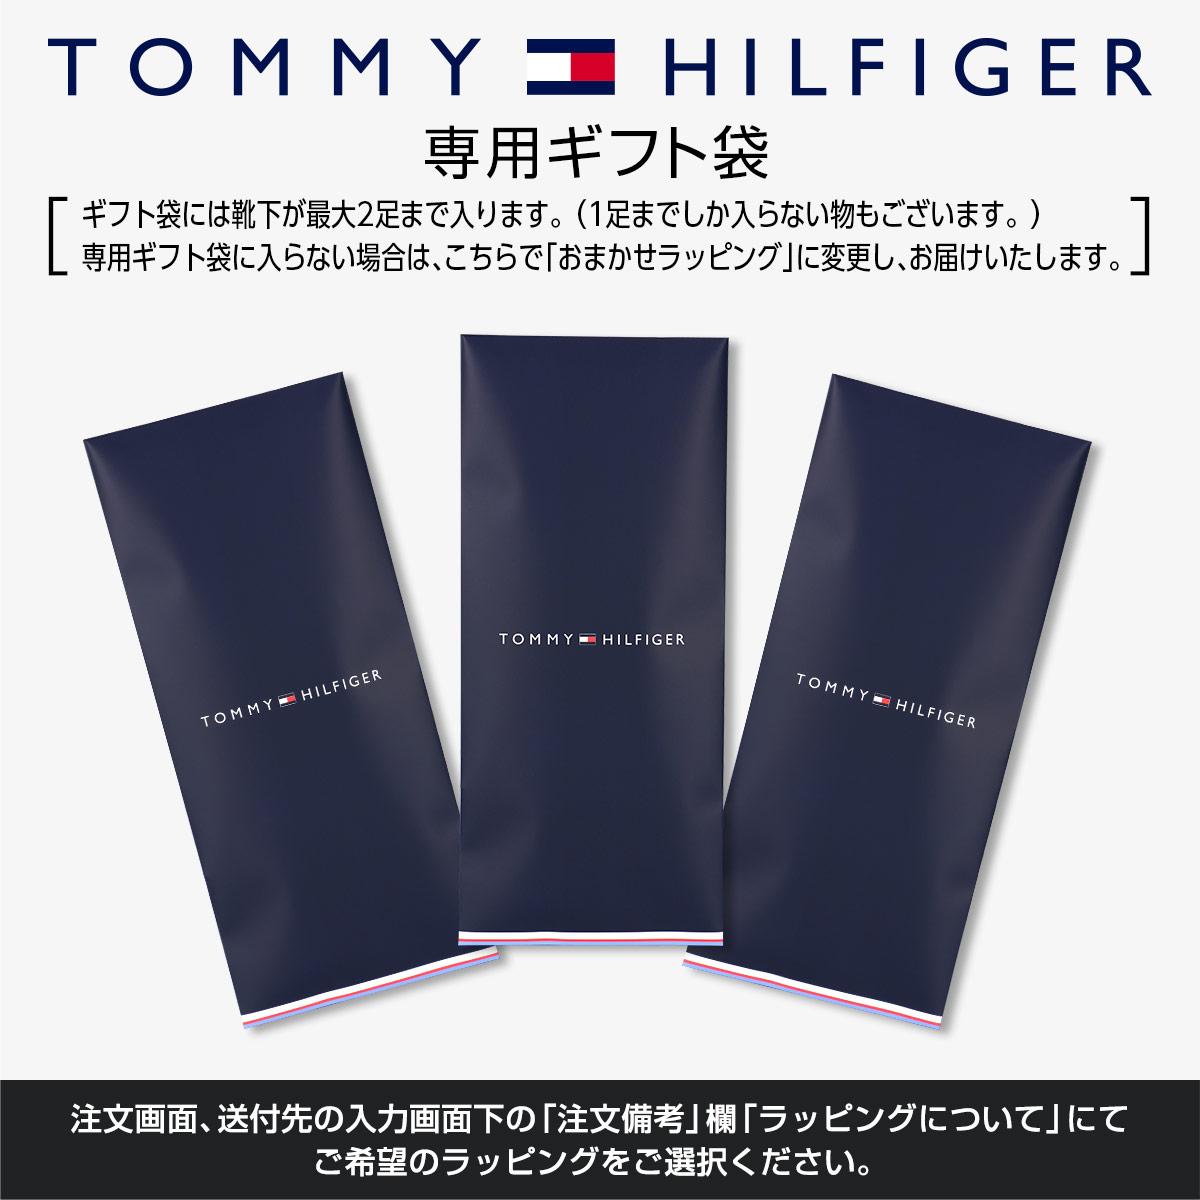 TOMMY HILFIGERソックスギフトラッピング